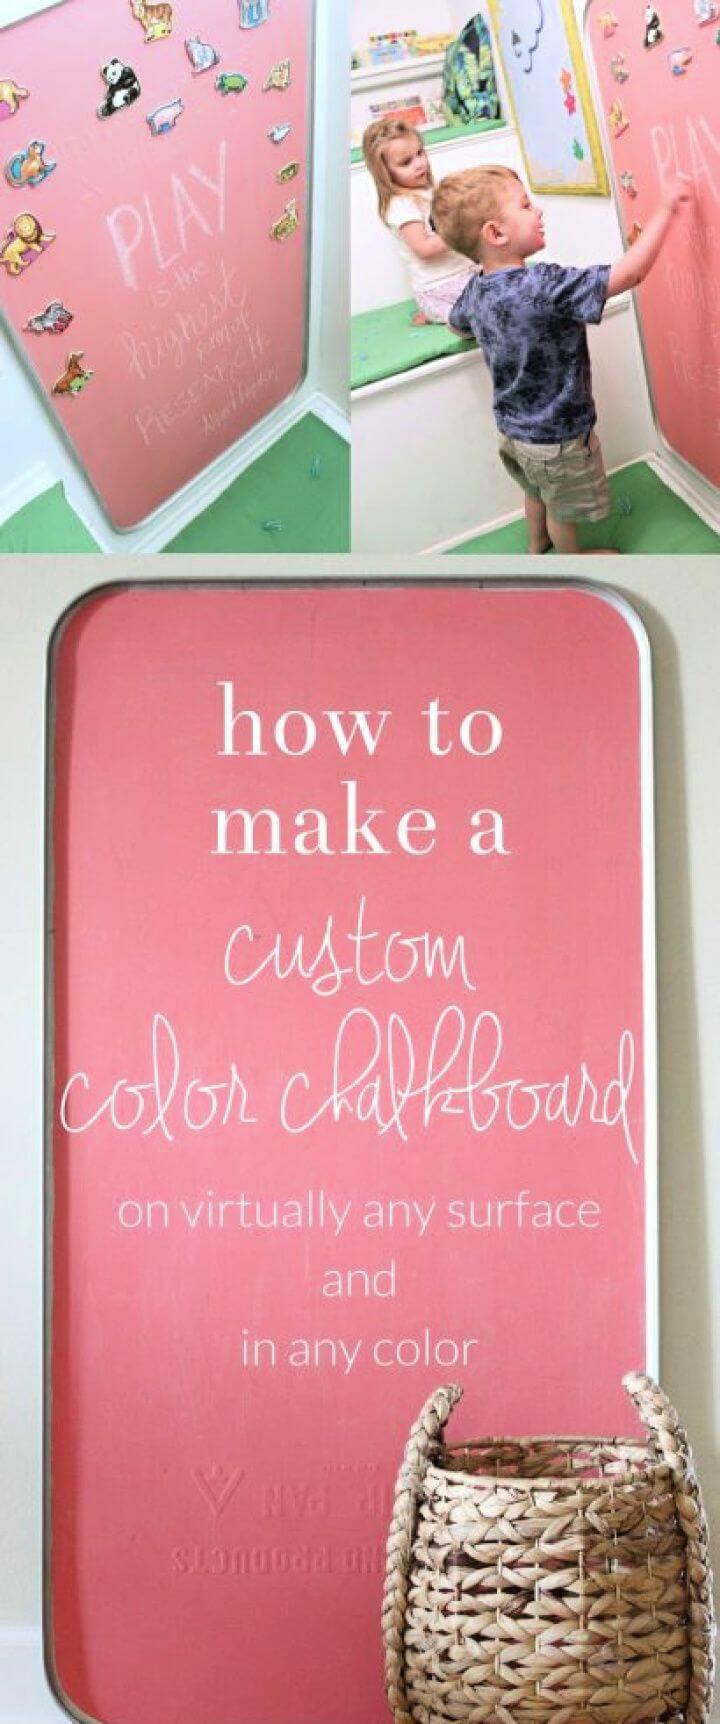 Making Custom Colored Chalkboard Paint